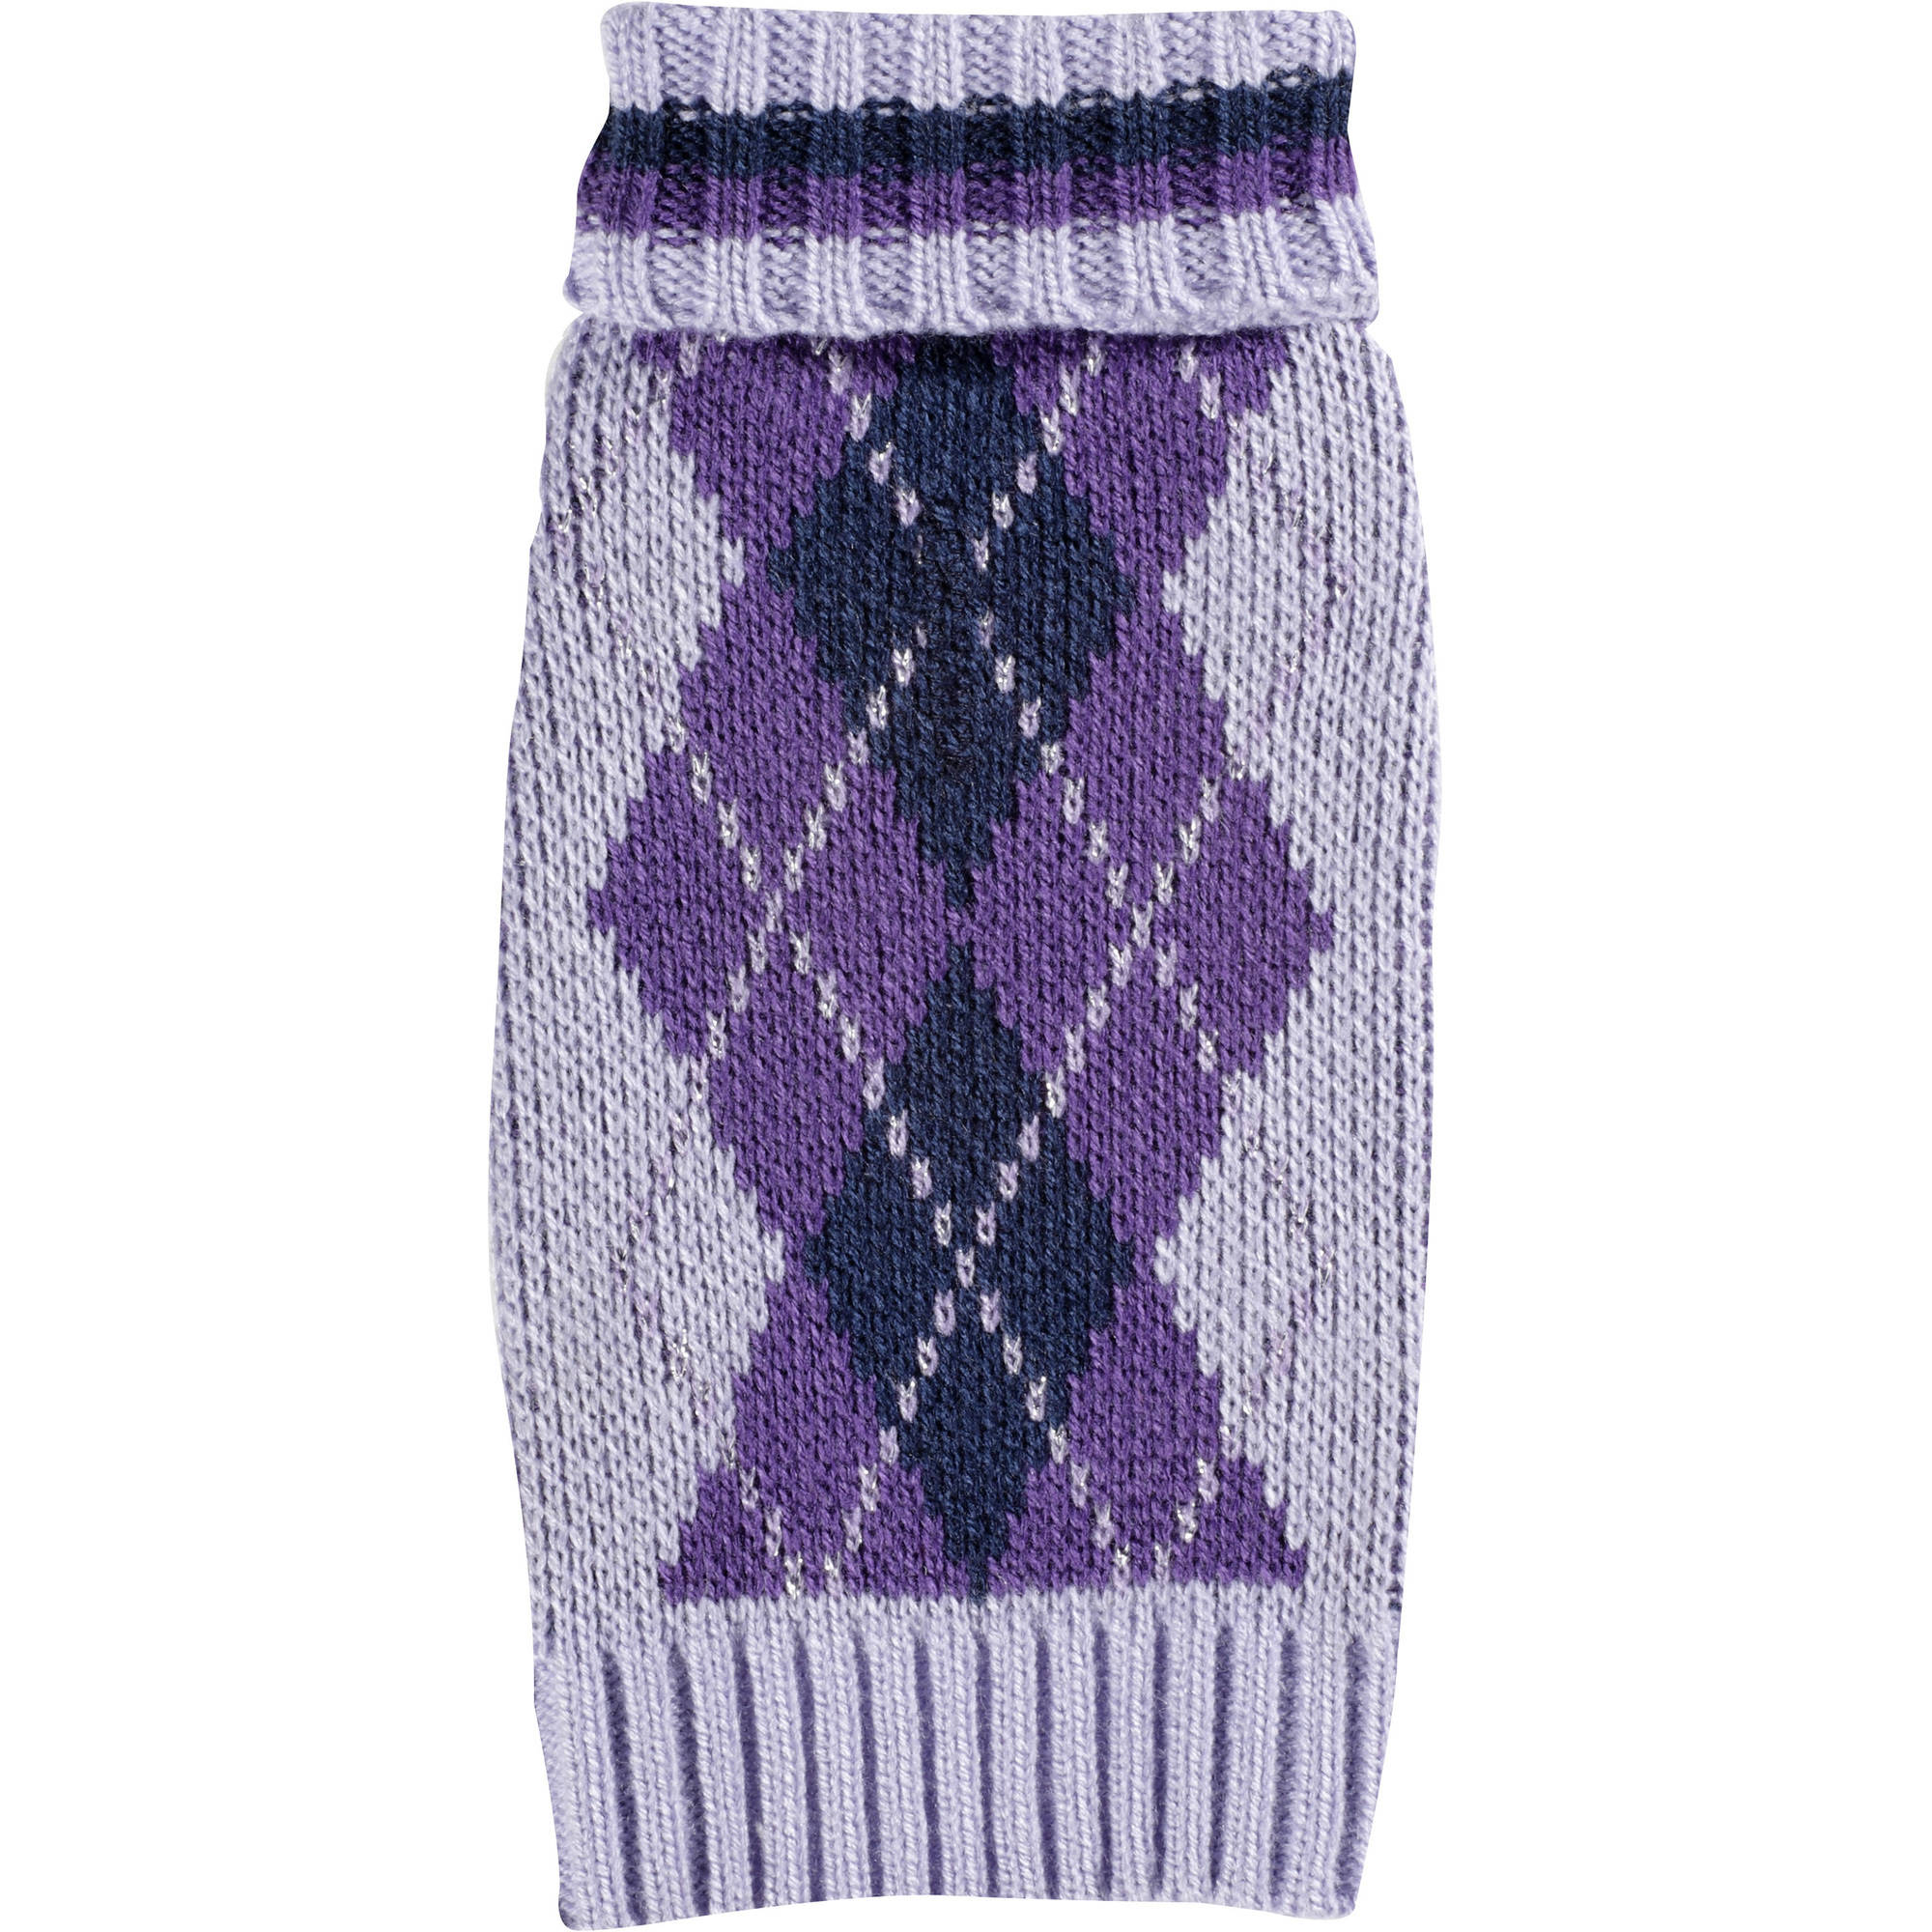 Fall/winter 2012 Dog Sweaters- Center Ar